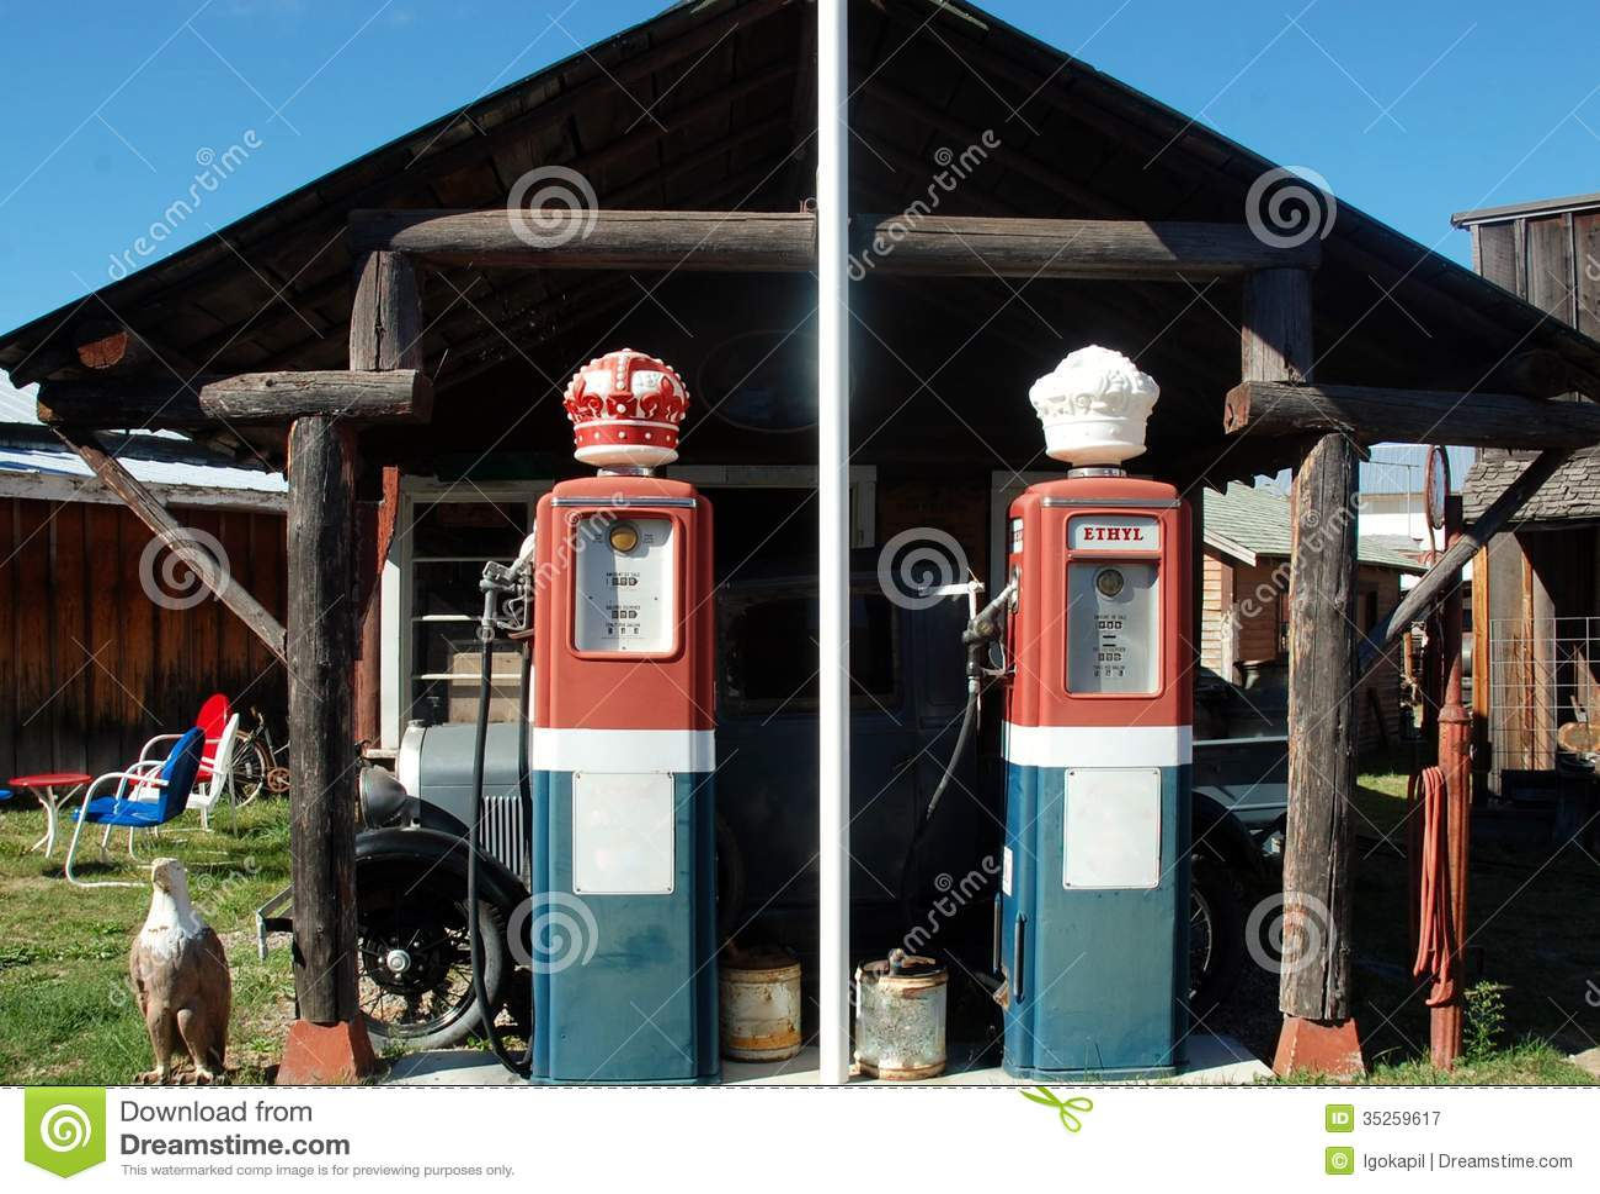 montana state retro gas station stock image image 35259617